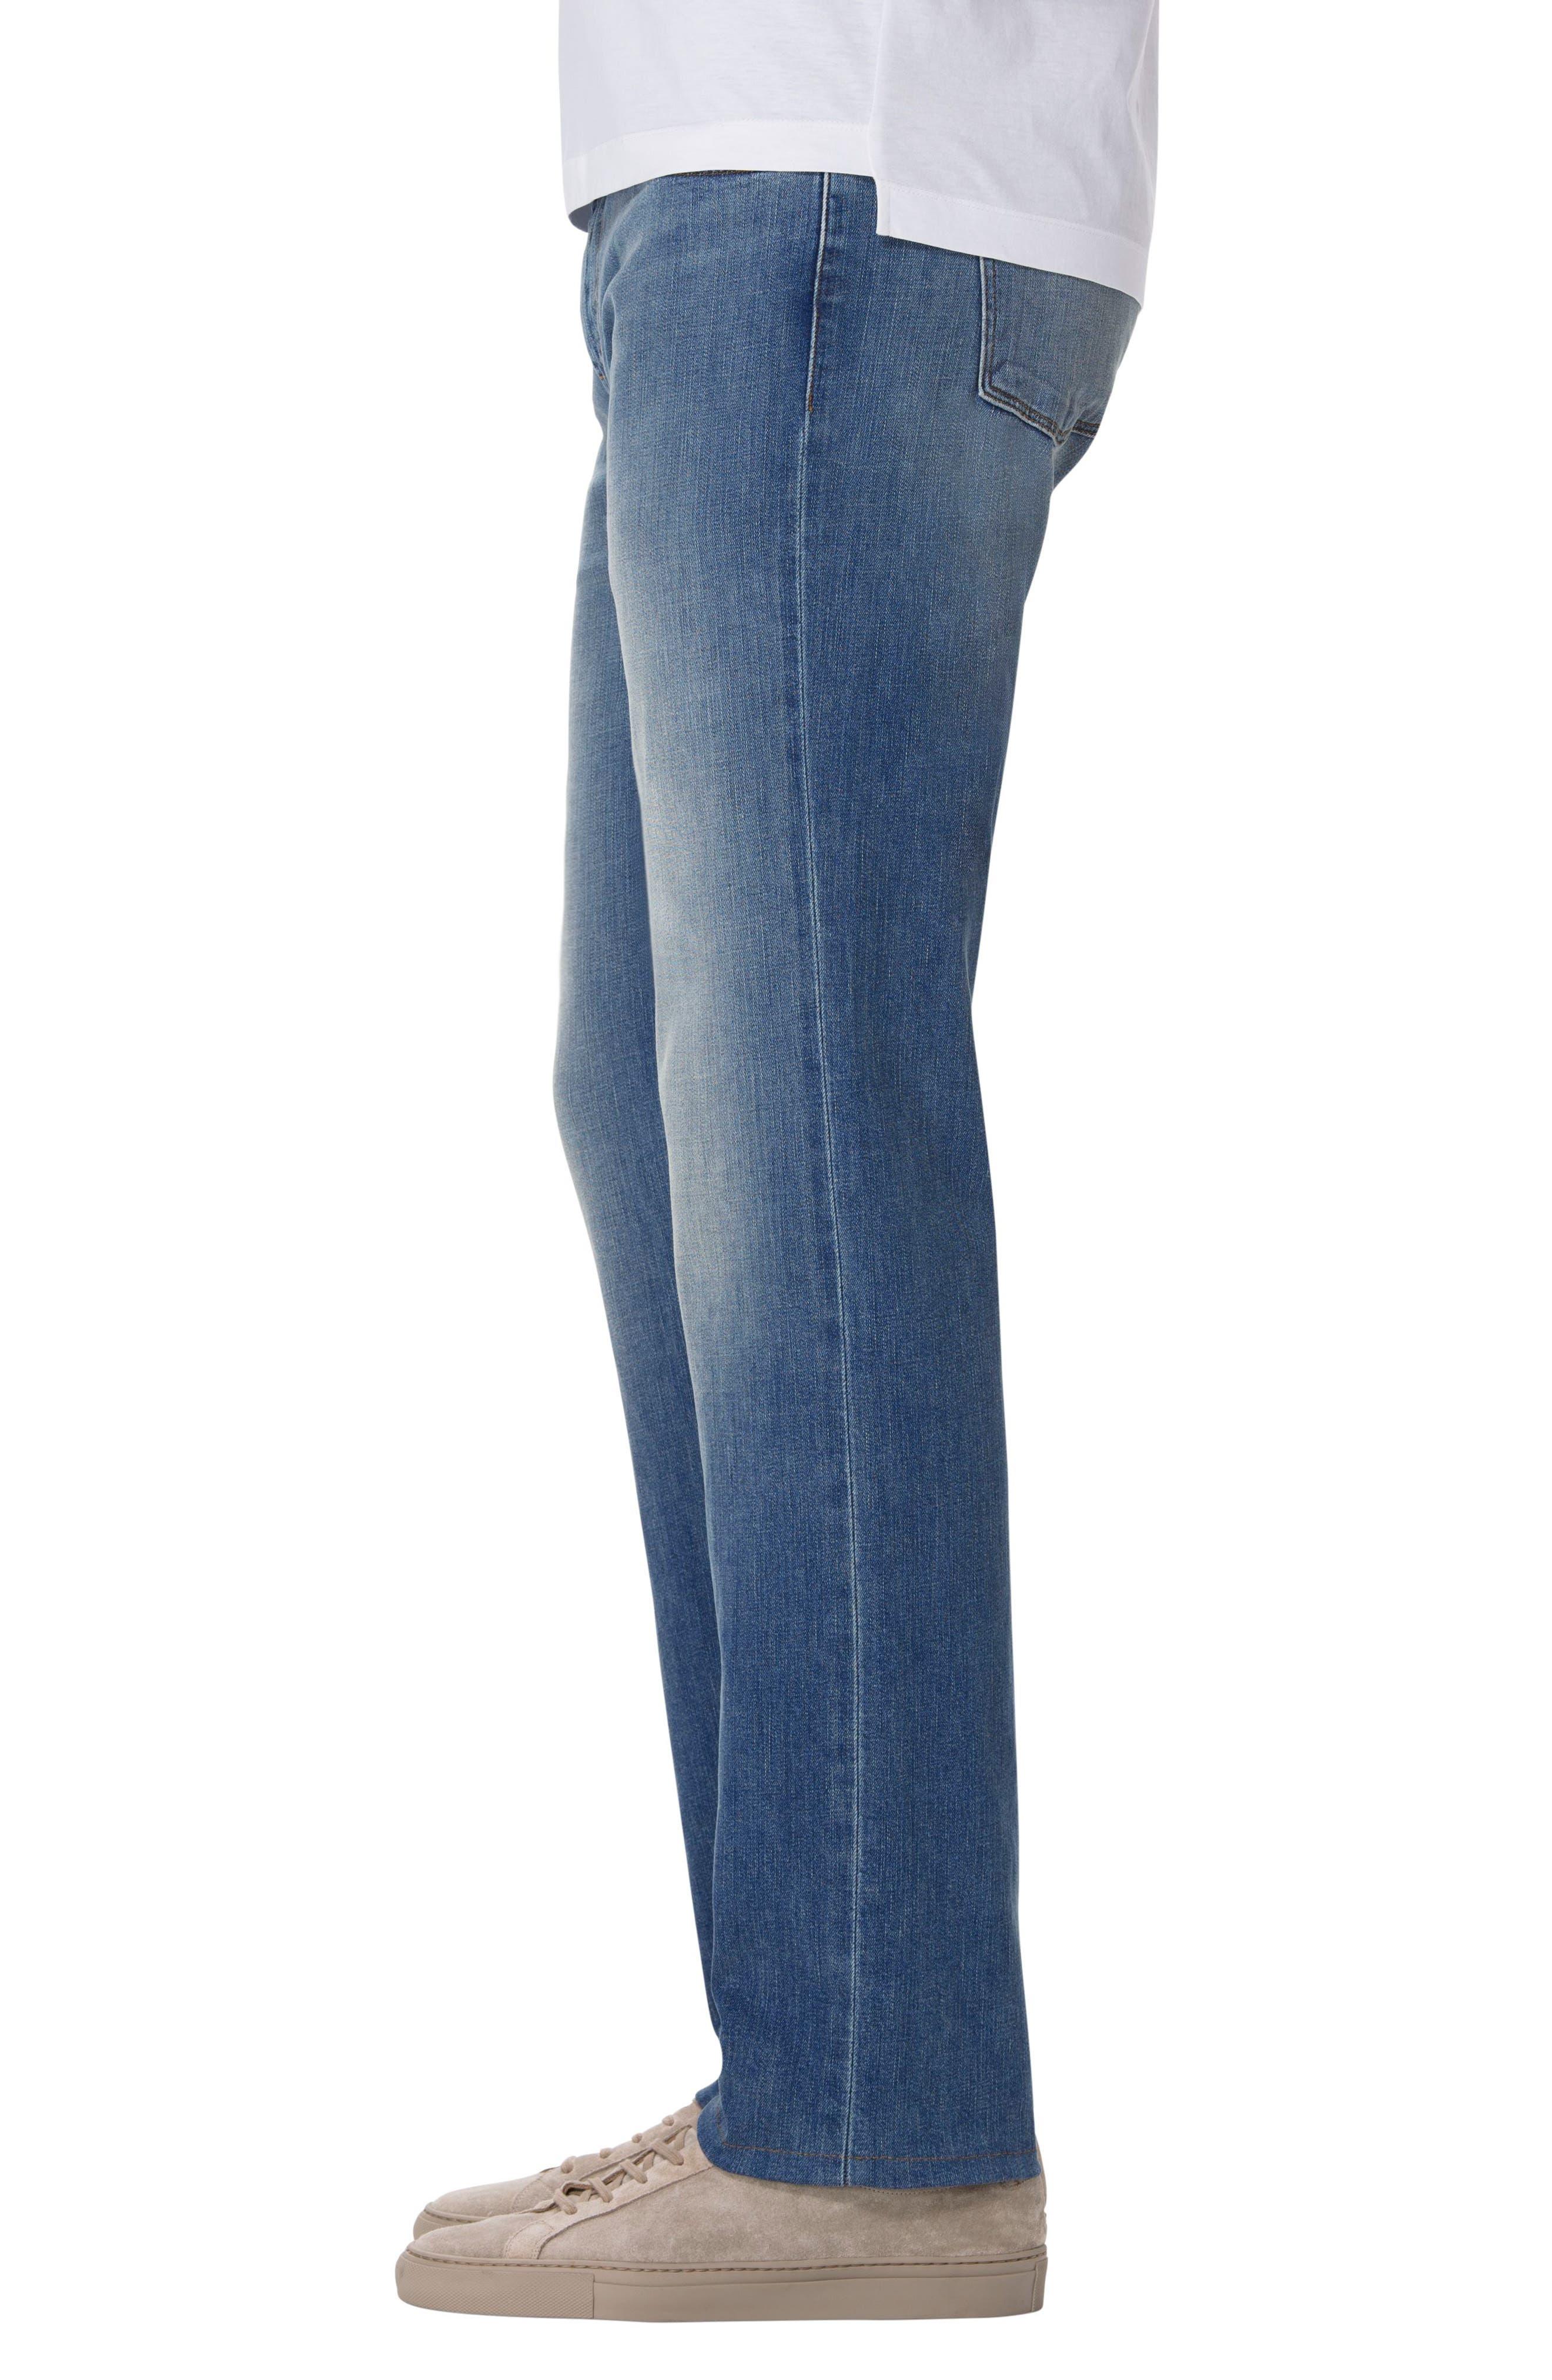 Alternate Image 3  - J Brand Kane Slim Straight Fit Jeans (Hydrogen)